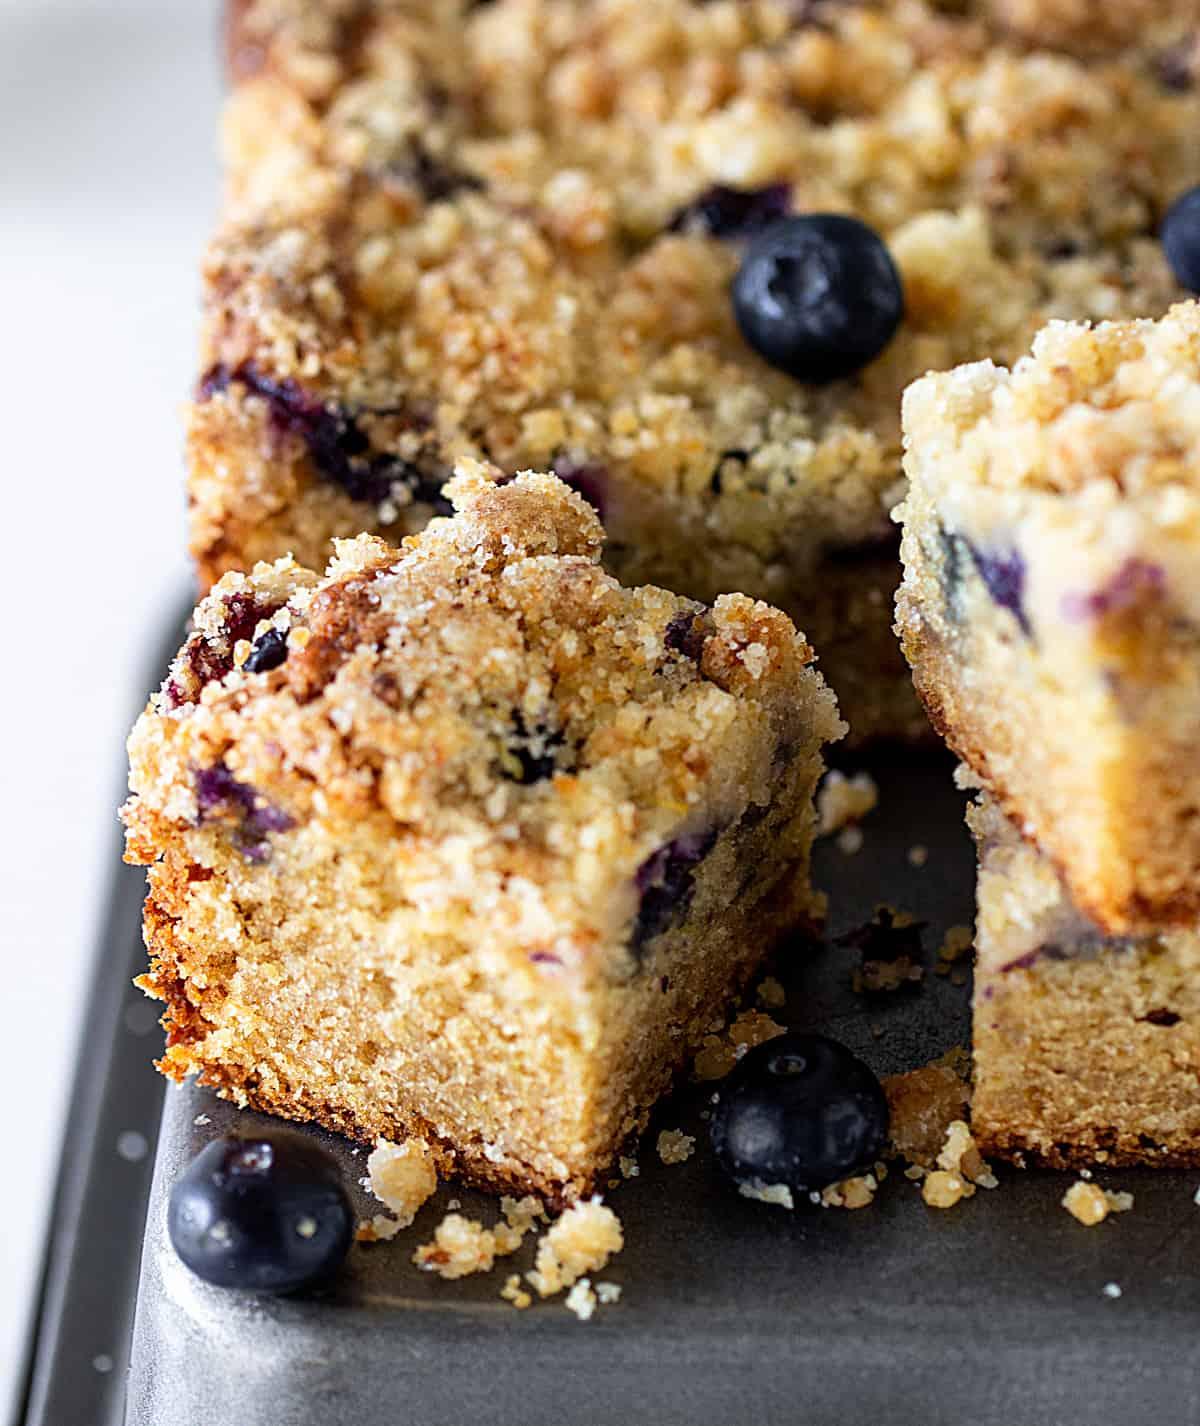 Close-up of crumb cake square on dark grey metal surface, loose blueberries around